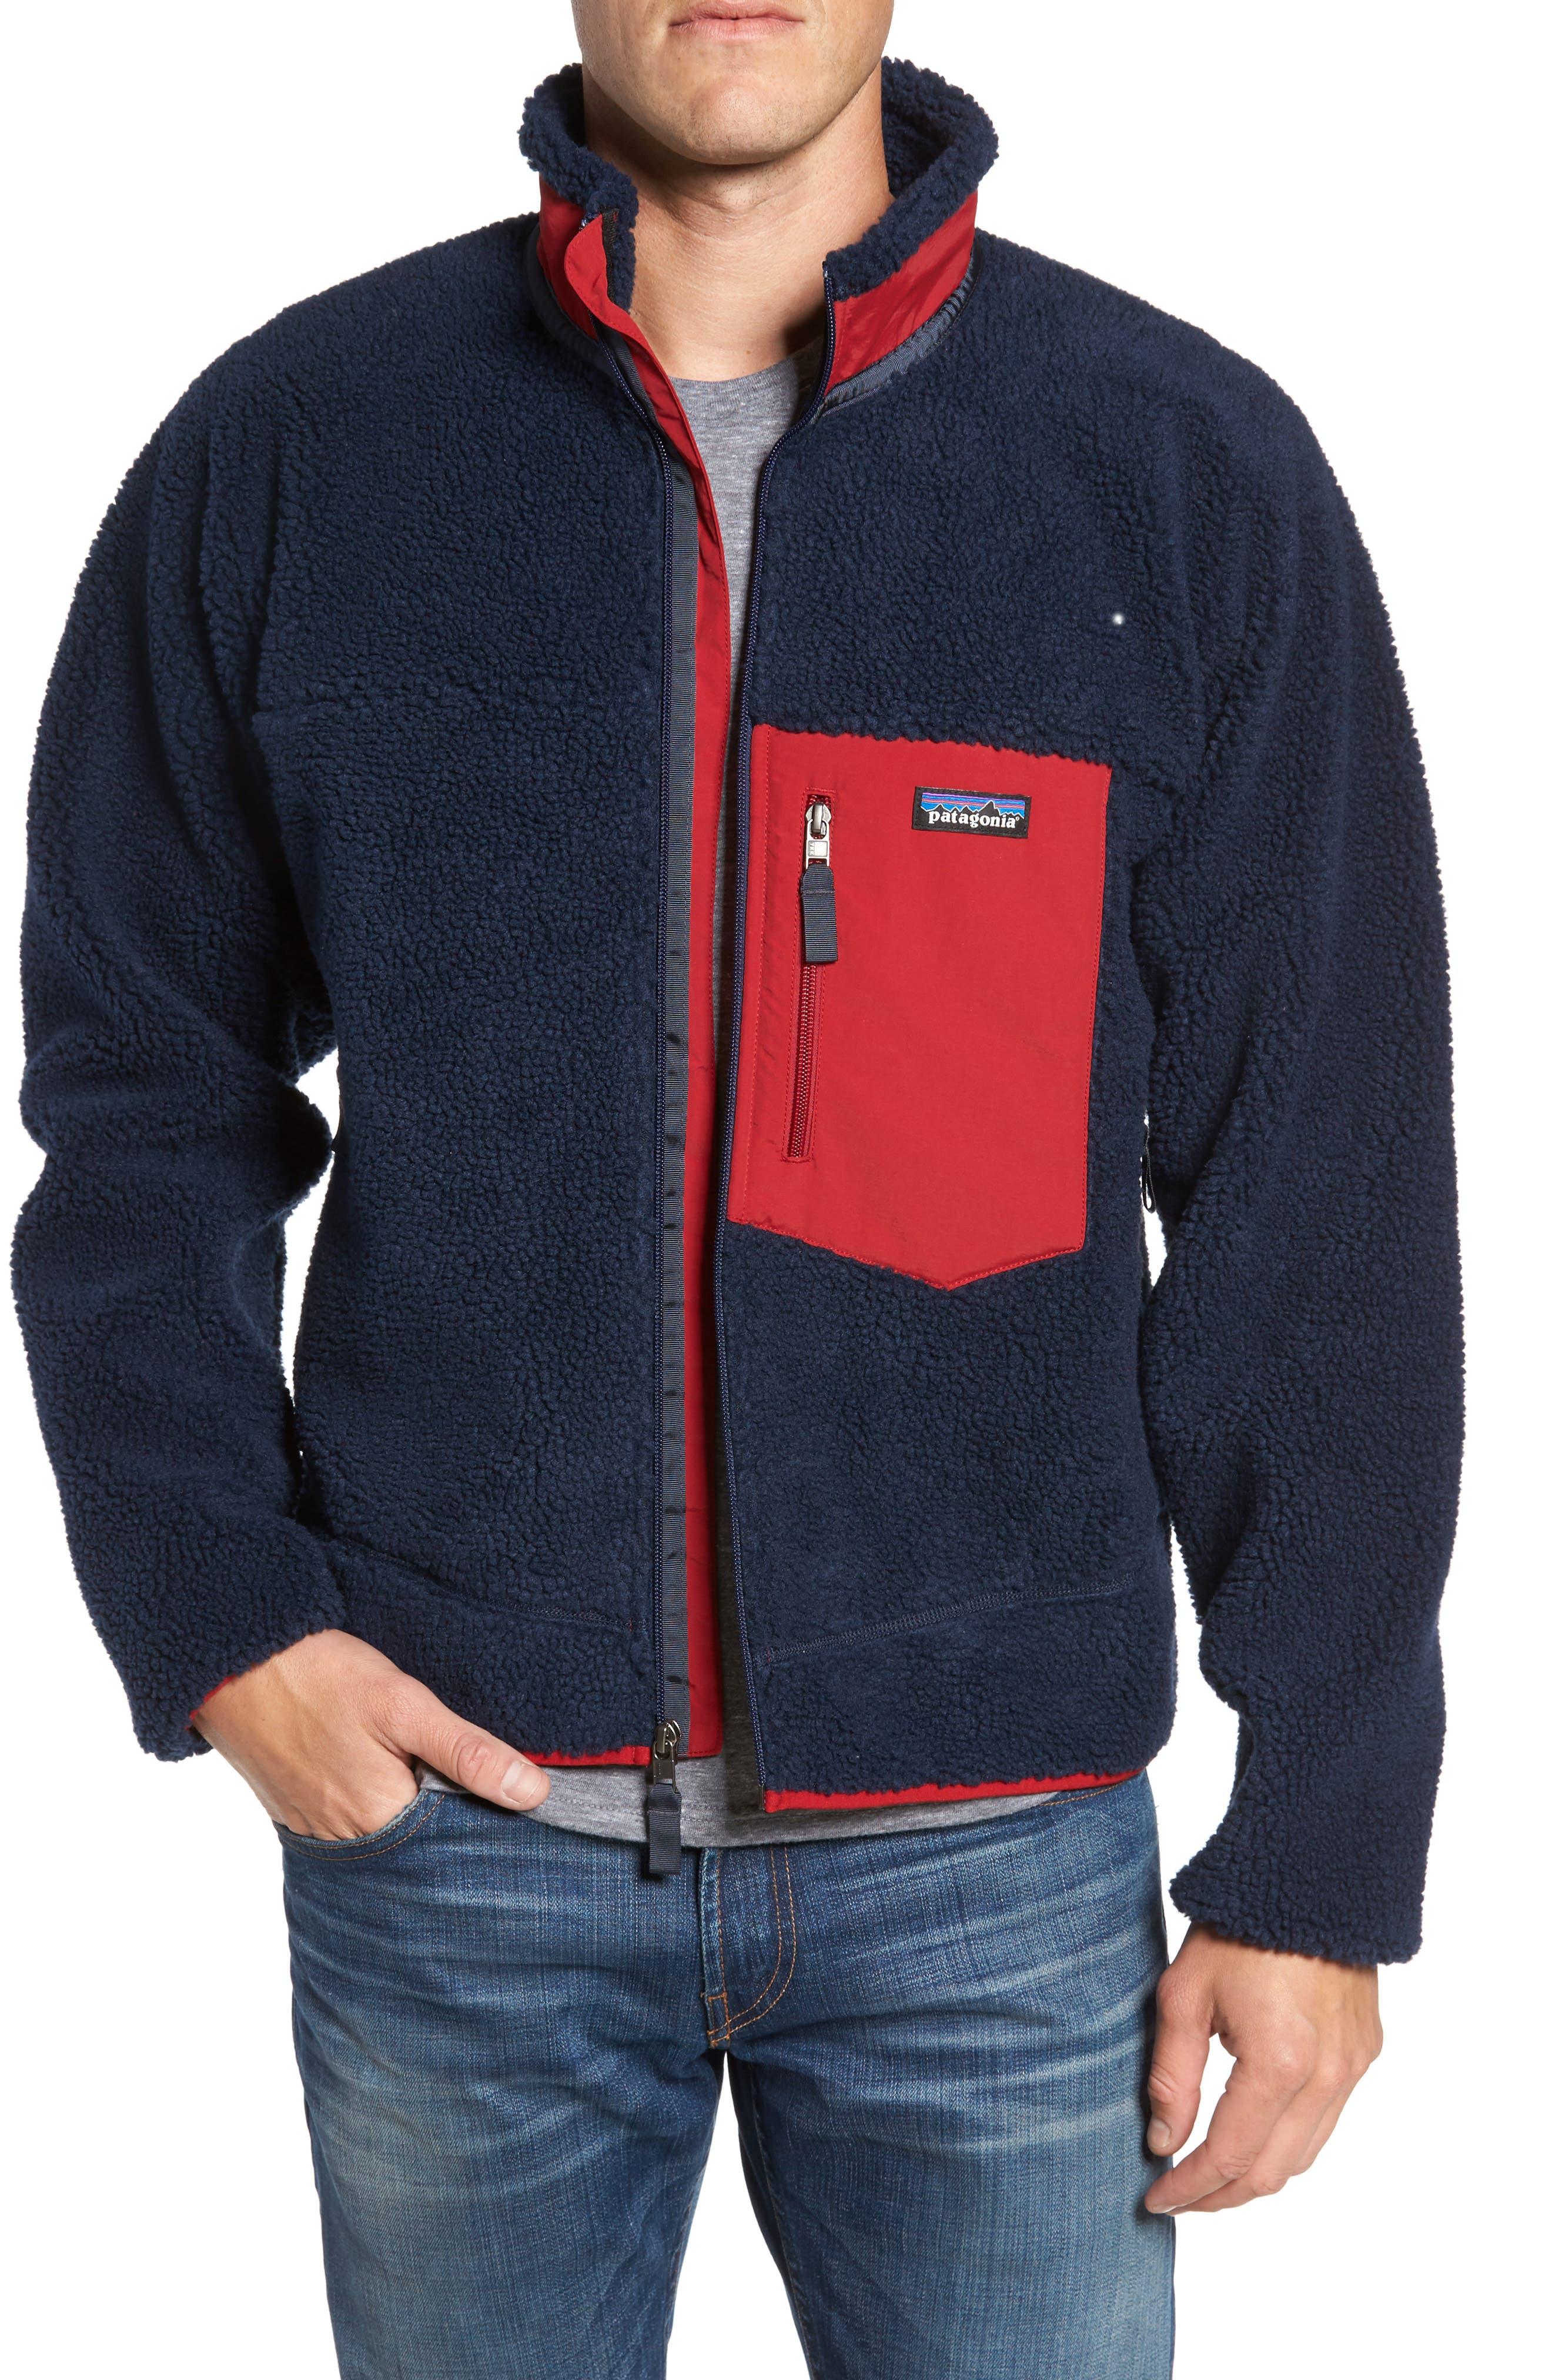 Main Image - Patagonia Retro-X Fleece Jacket